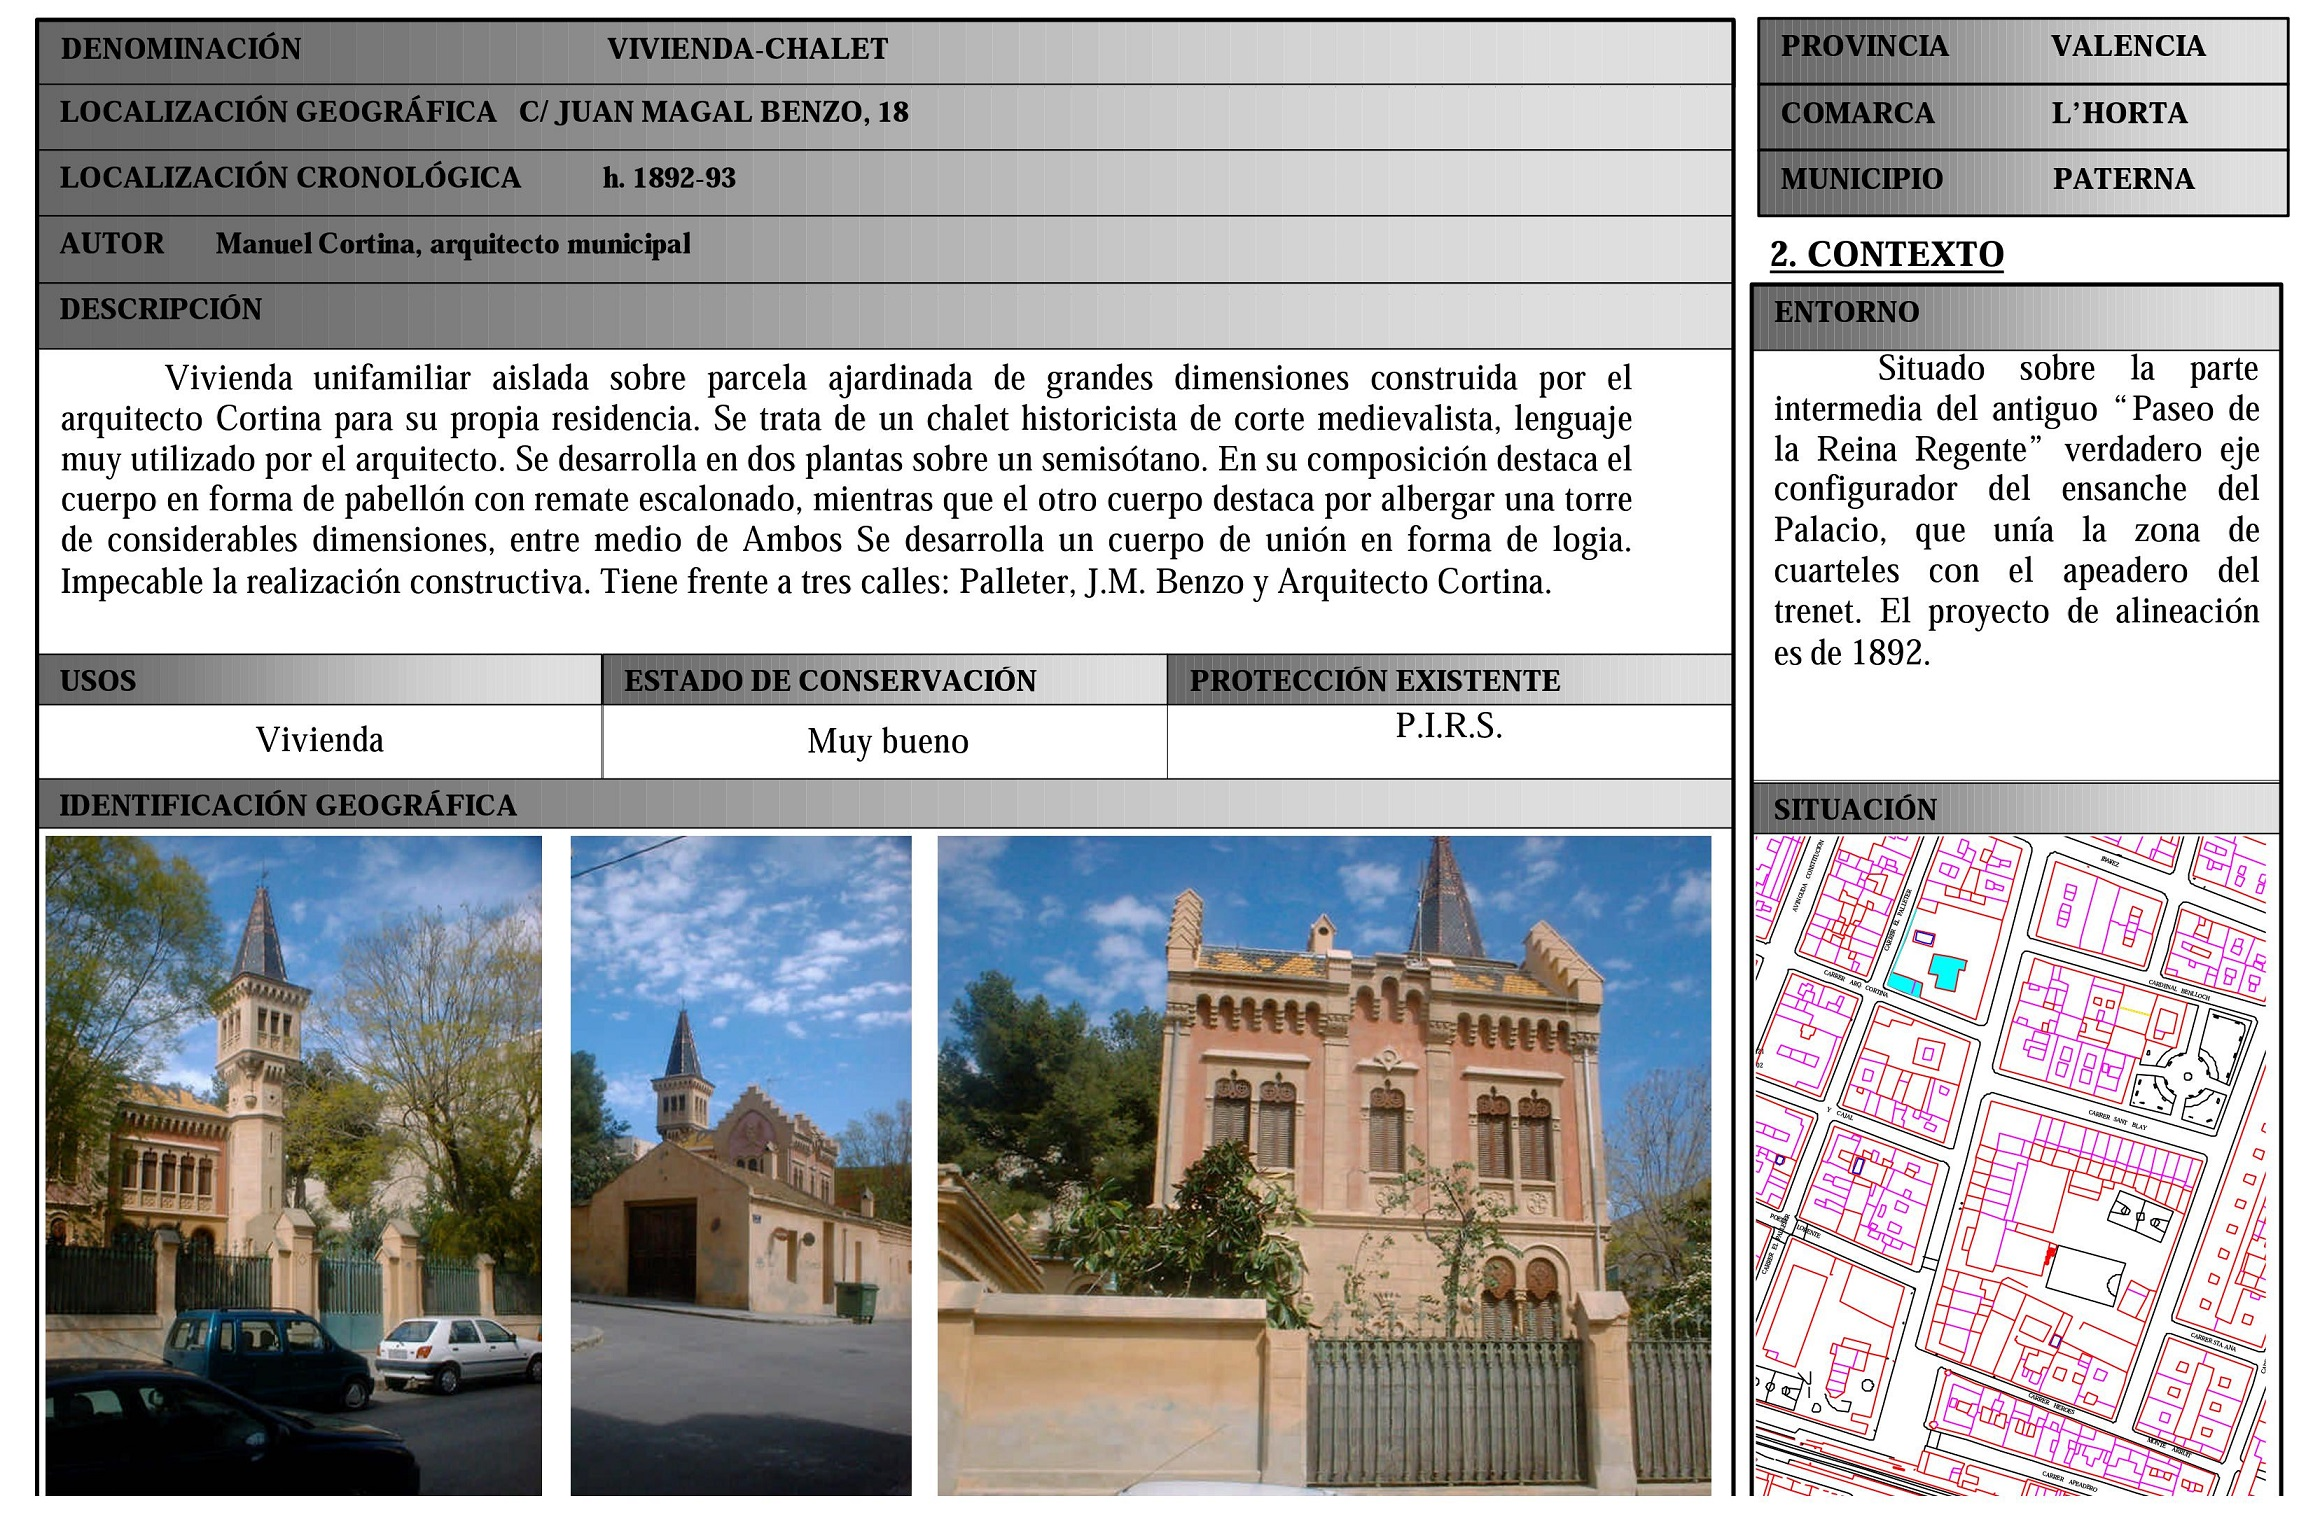 Fuente: Archivo Municipal de Paterna.